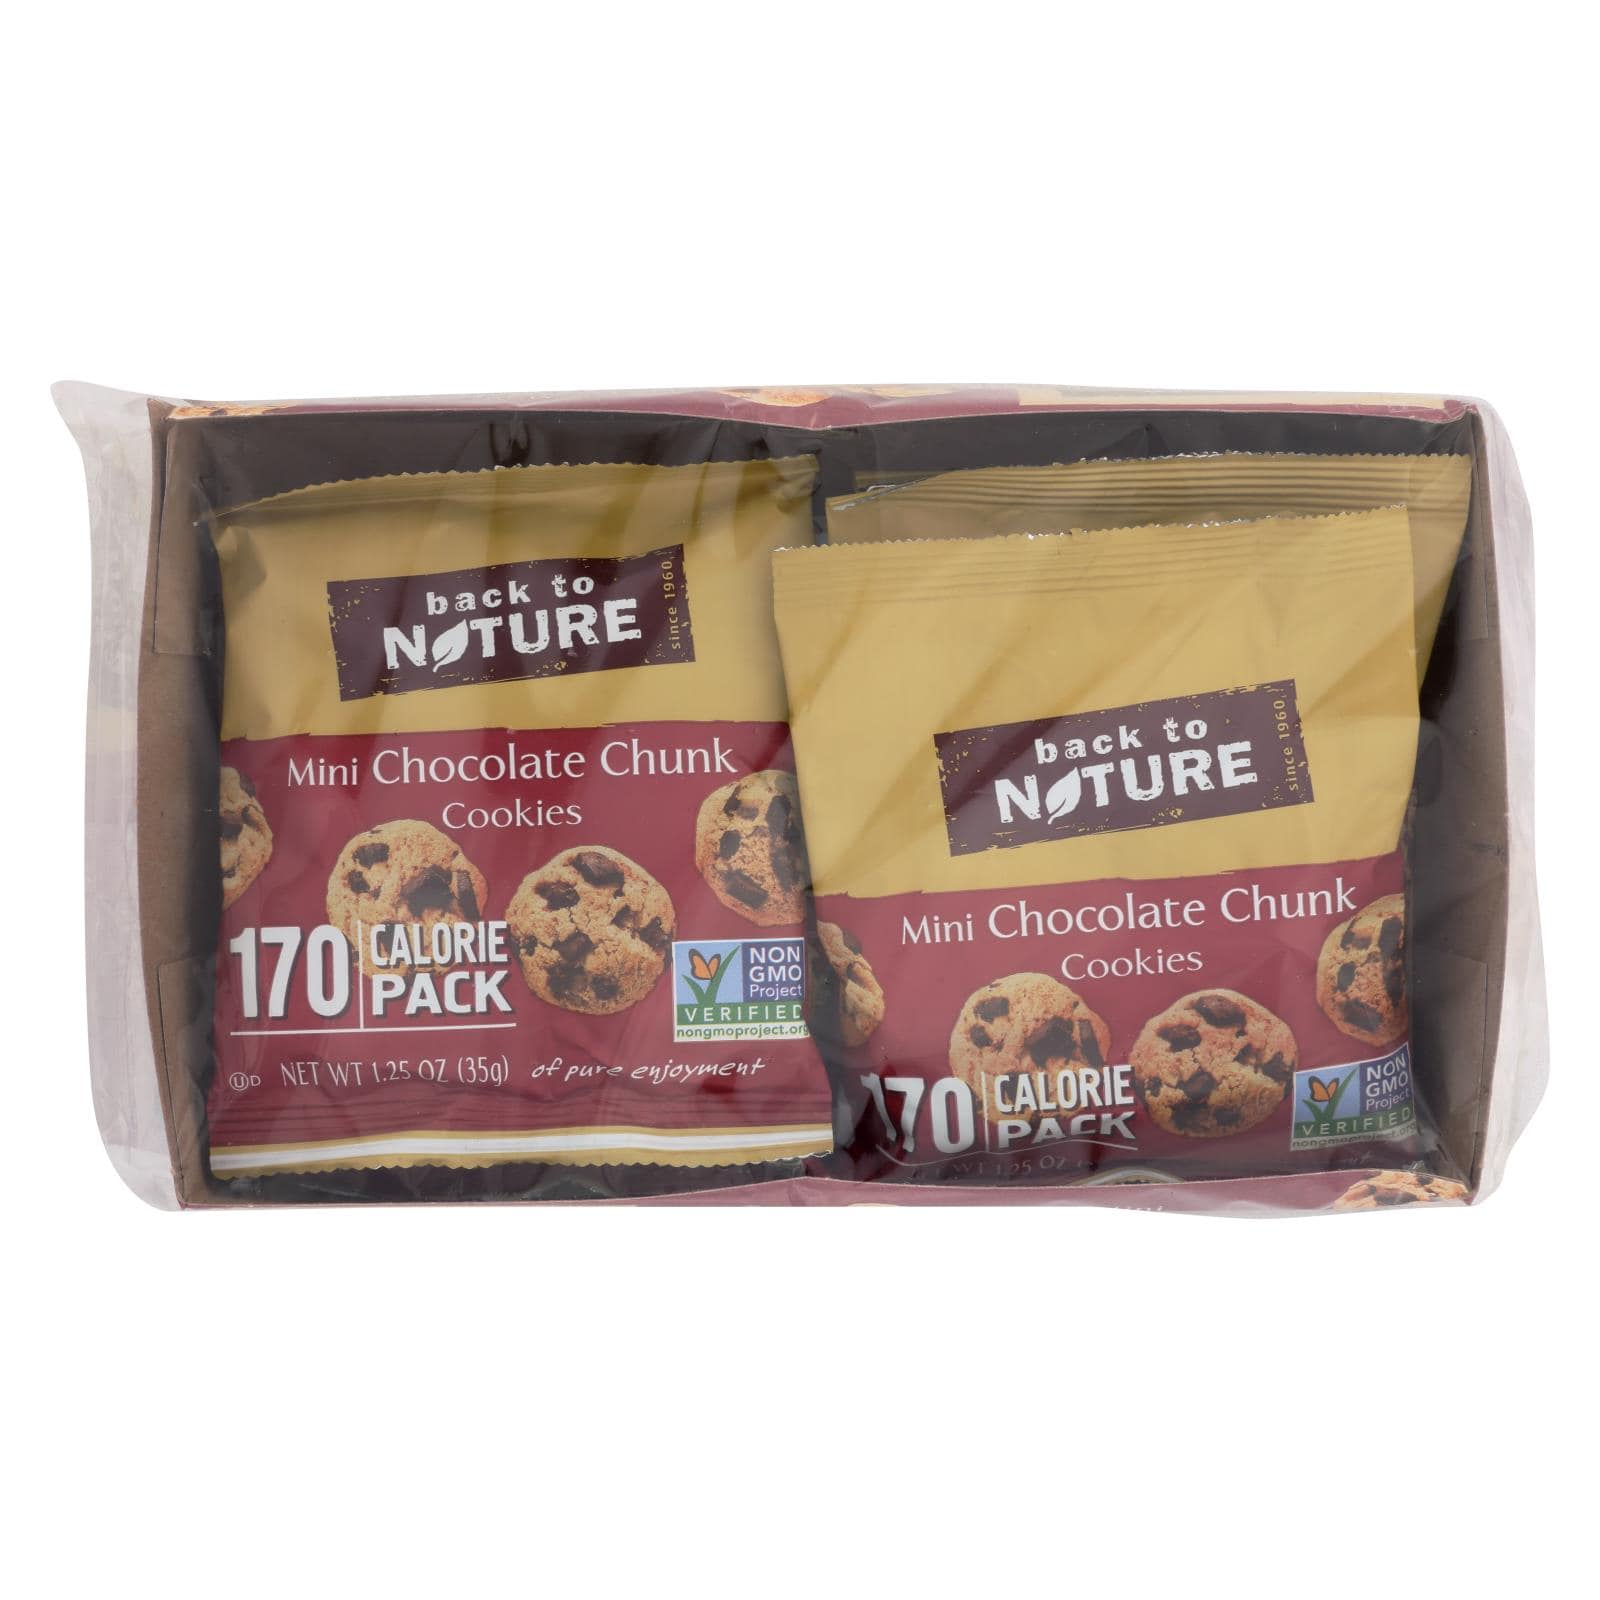 Back to Nature Cookies - Mini Chocolate Chunk